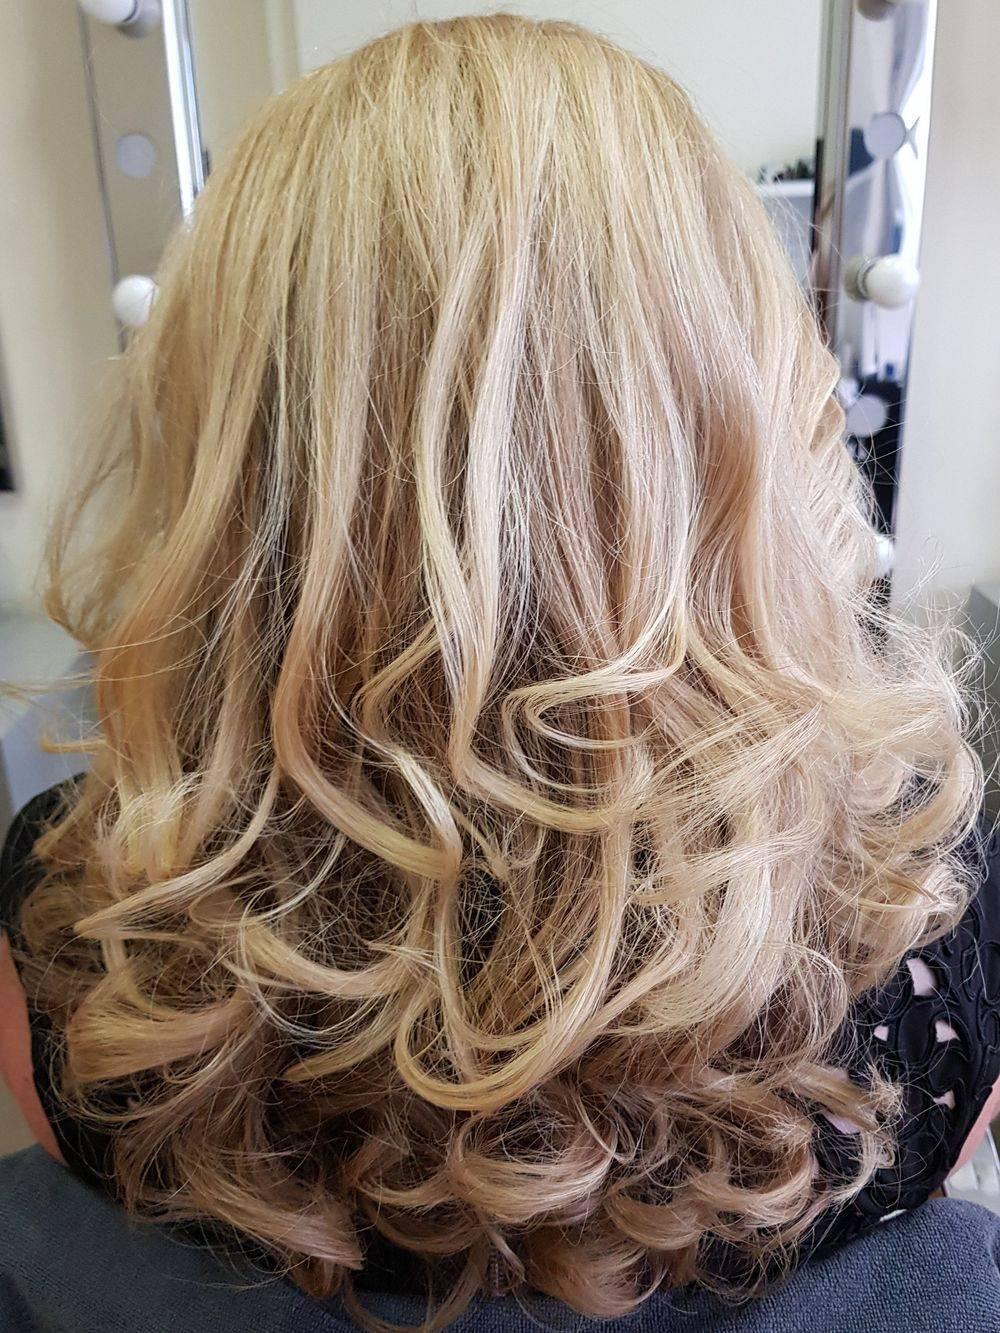 Temple Holborn Strand London Hairdressers hair salon Blow dry